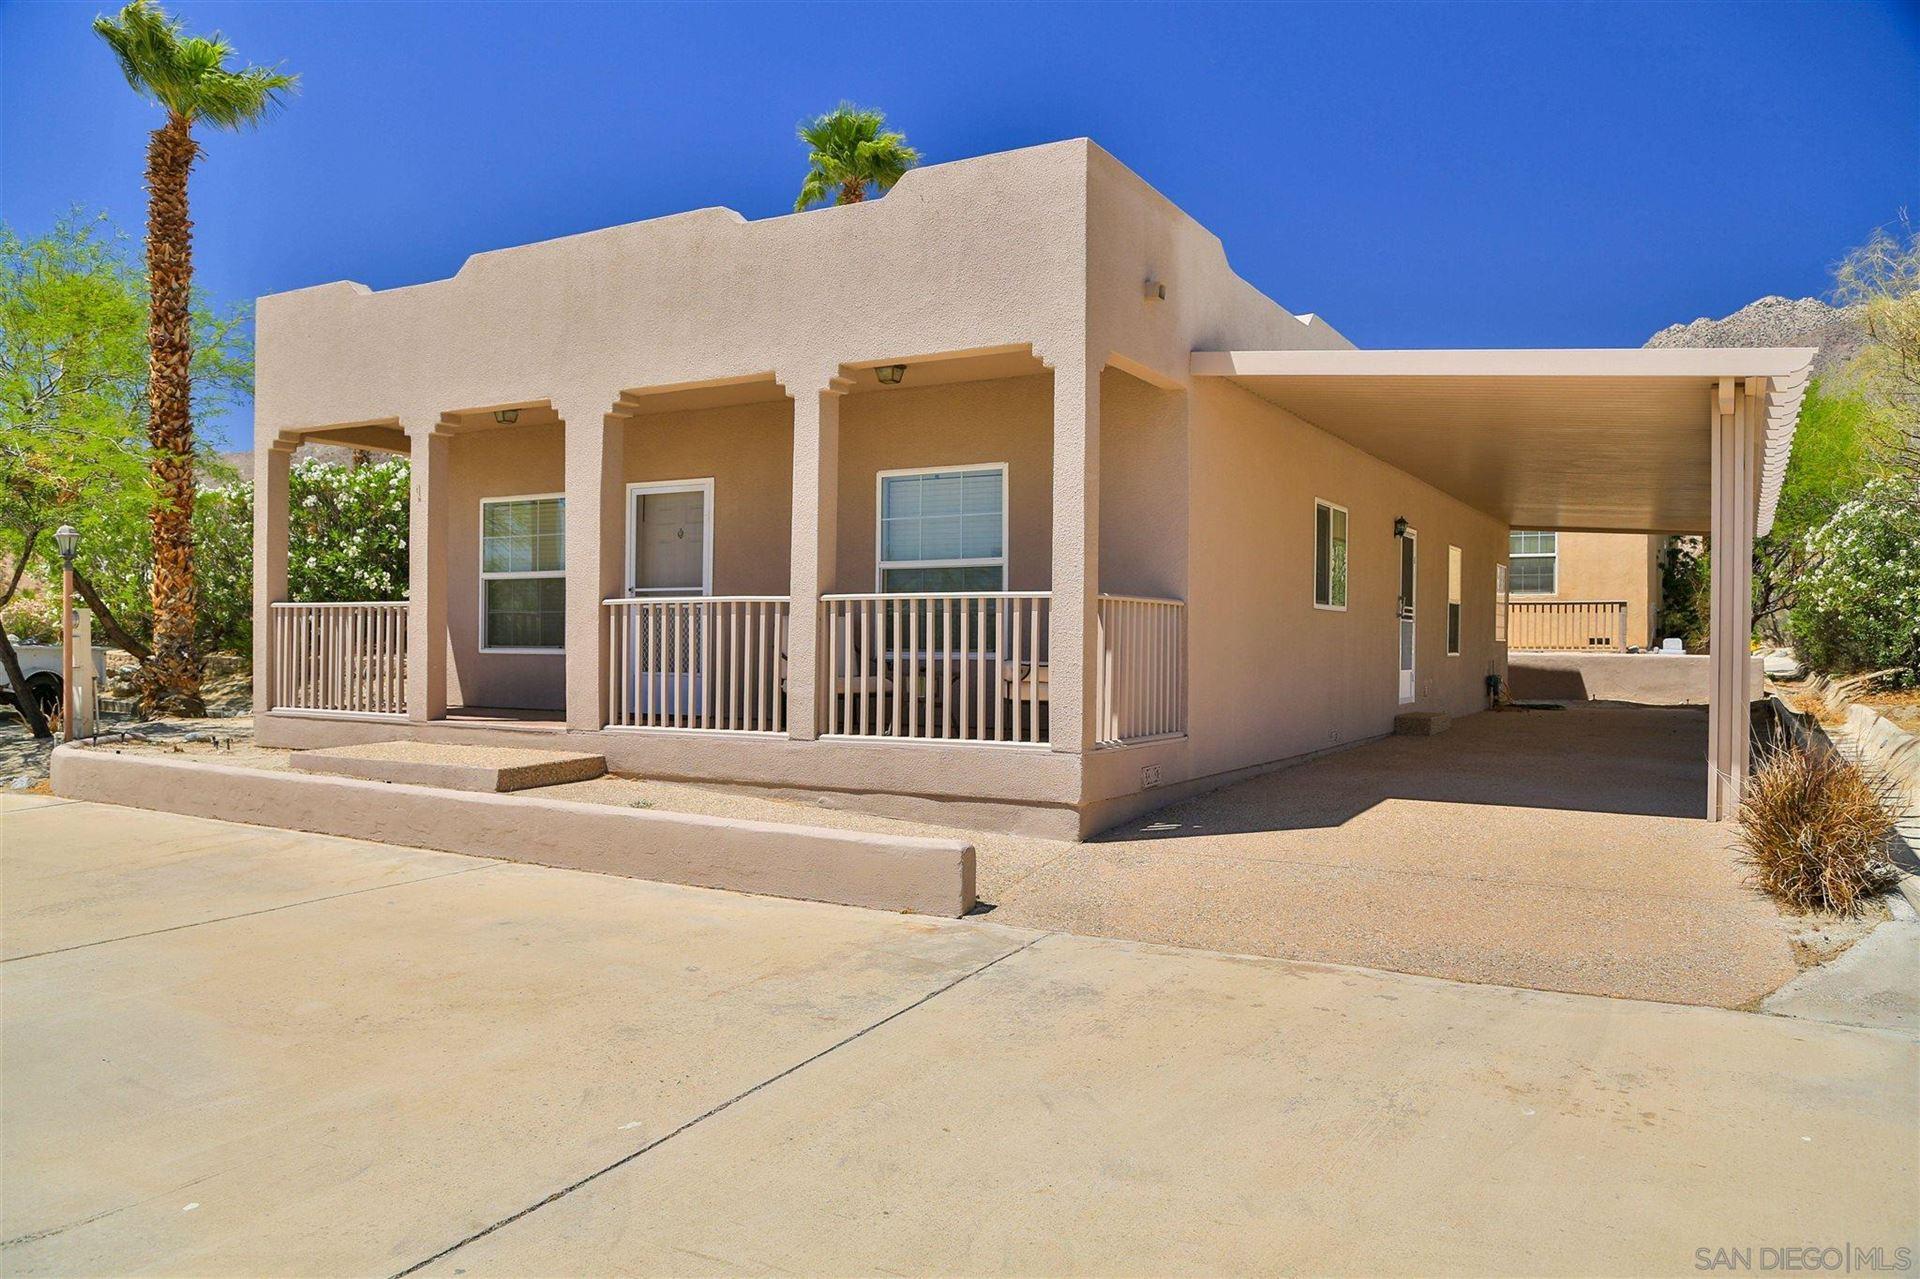 330 Palm Canyon Dr #1, Borrego Springs, CA 92004 - MLS#: 210012030